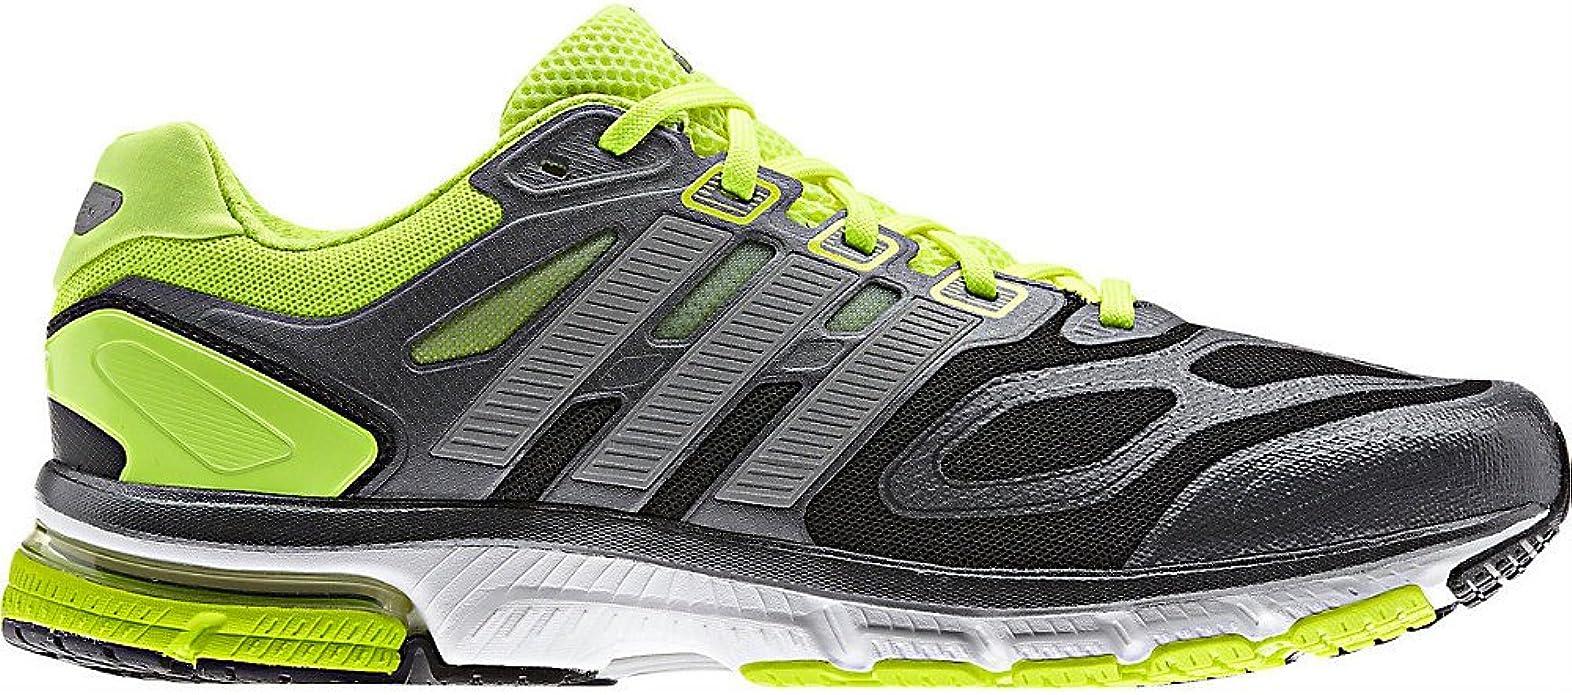 Adidas Supernova Sequence 6 M Textile, Zapatillas para Hombre, Negro, 39 1/3 EU: Amazon.es: Zapatos y complementos